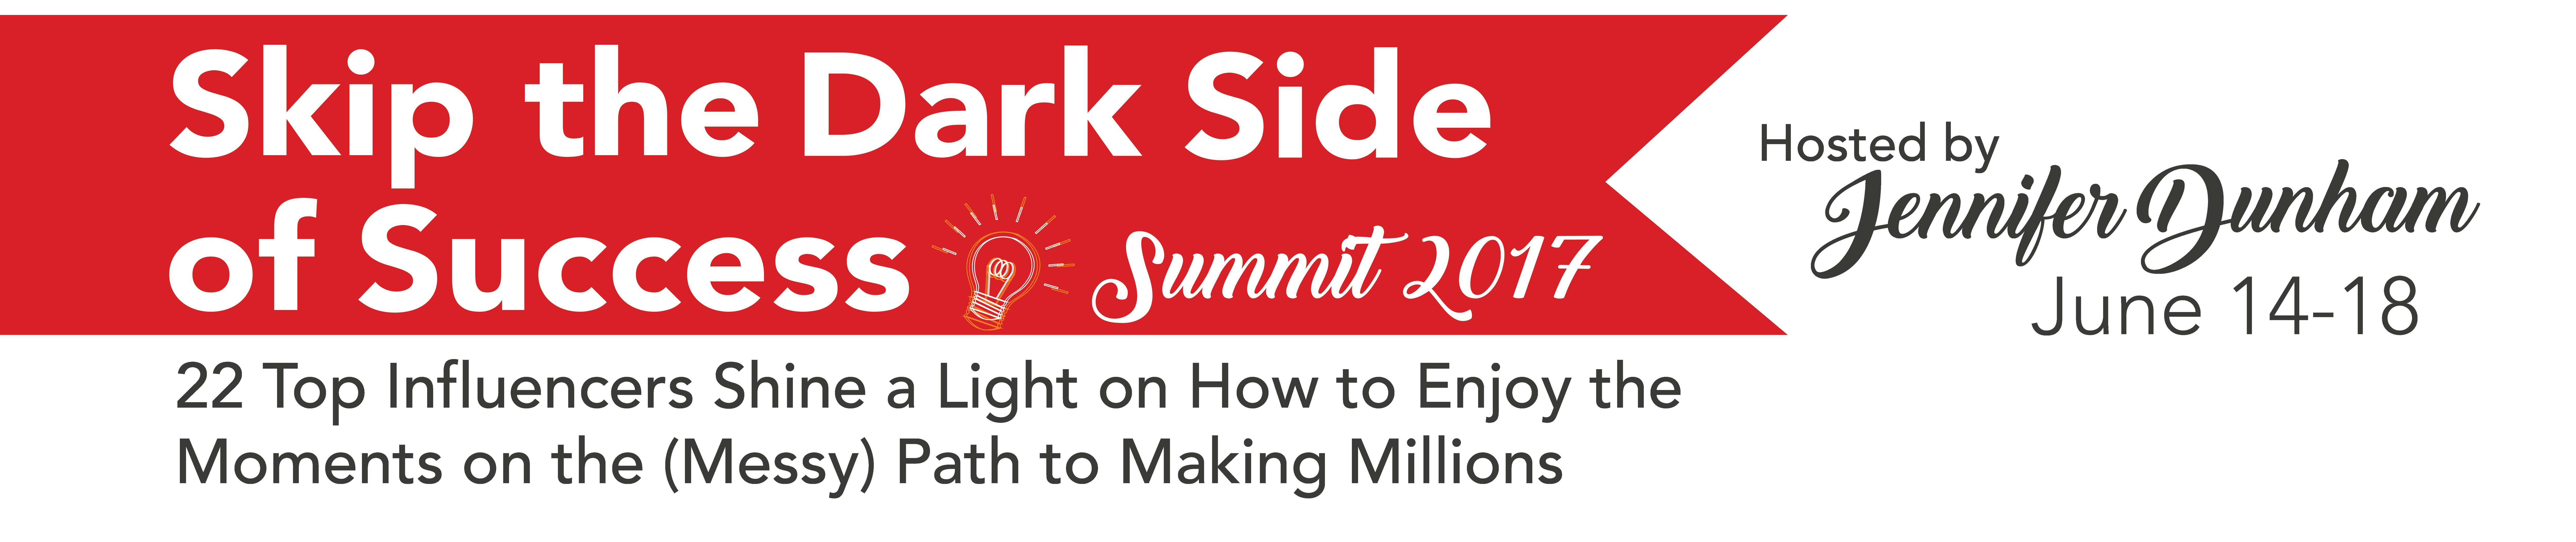 Skip the Dark Side of Success